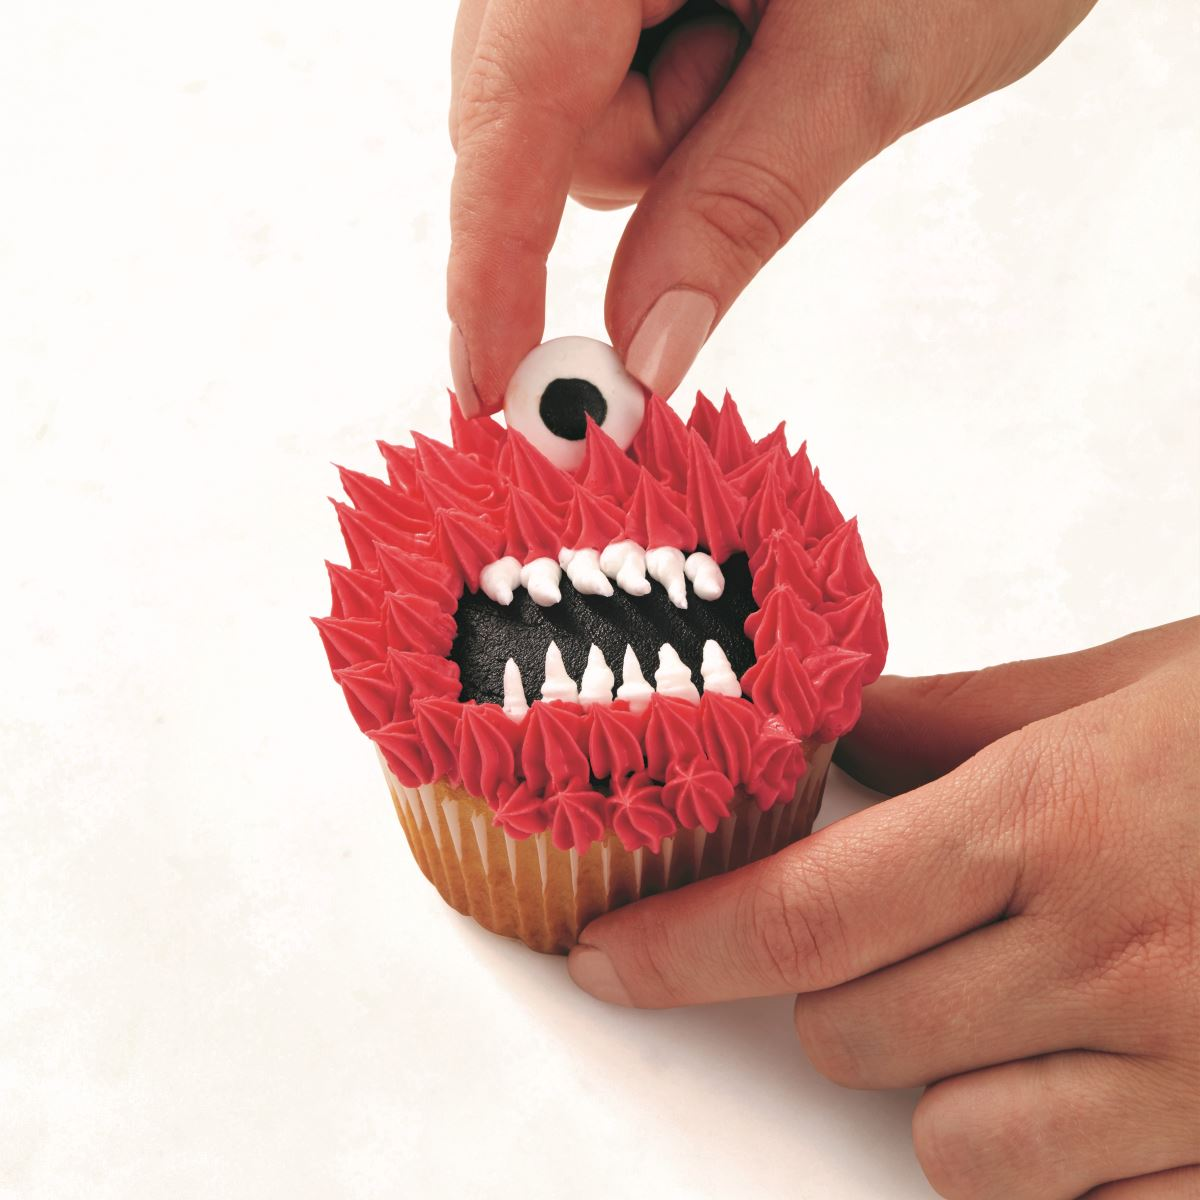 PINK ONE-EYED MONSTER CUPCAKE step 5